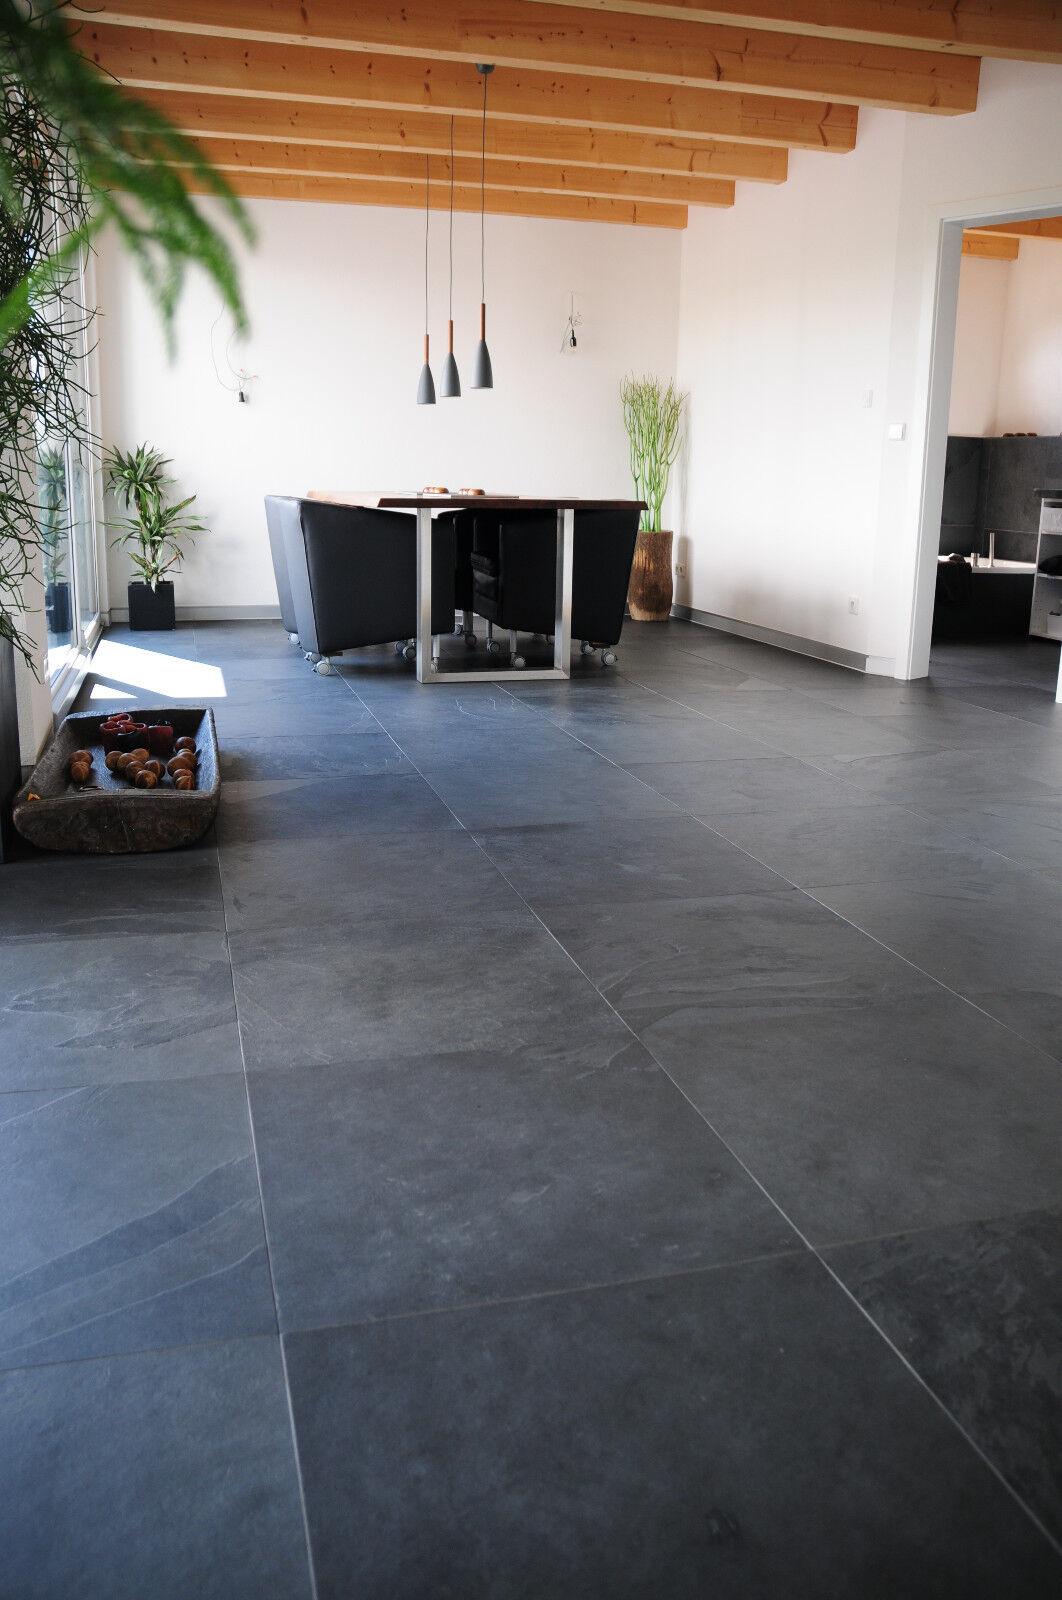 1 qm brasilianischer schiefer 30x60x1cm naturstein anthrazit sehr edel eur 21 00 picclick de. Black Bedroom Furniture Sets. Home Design Ideas